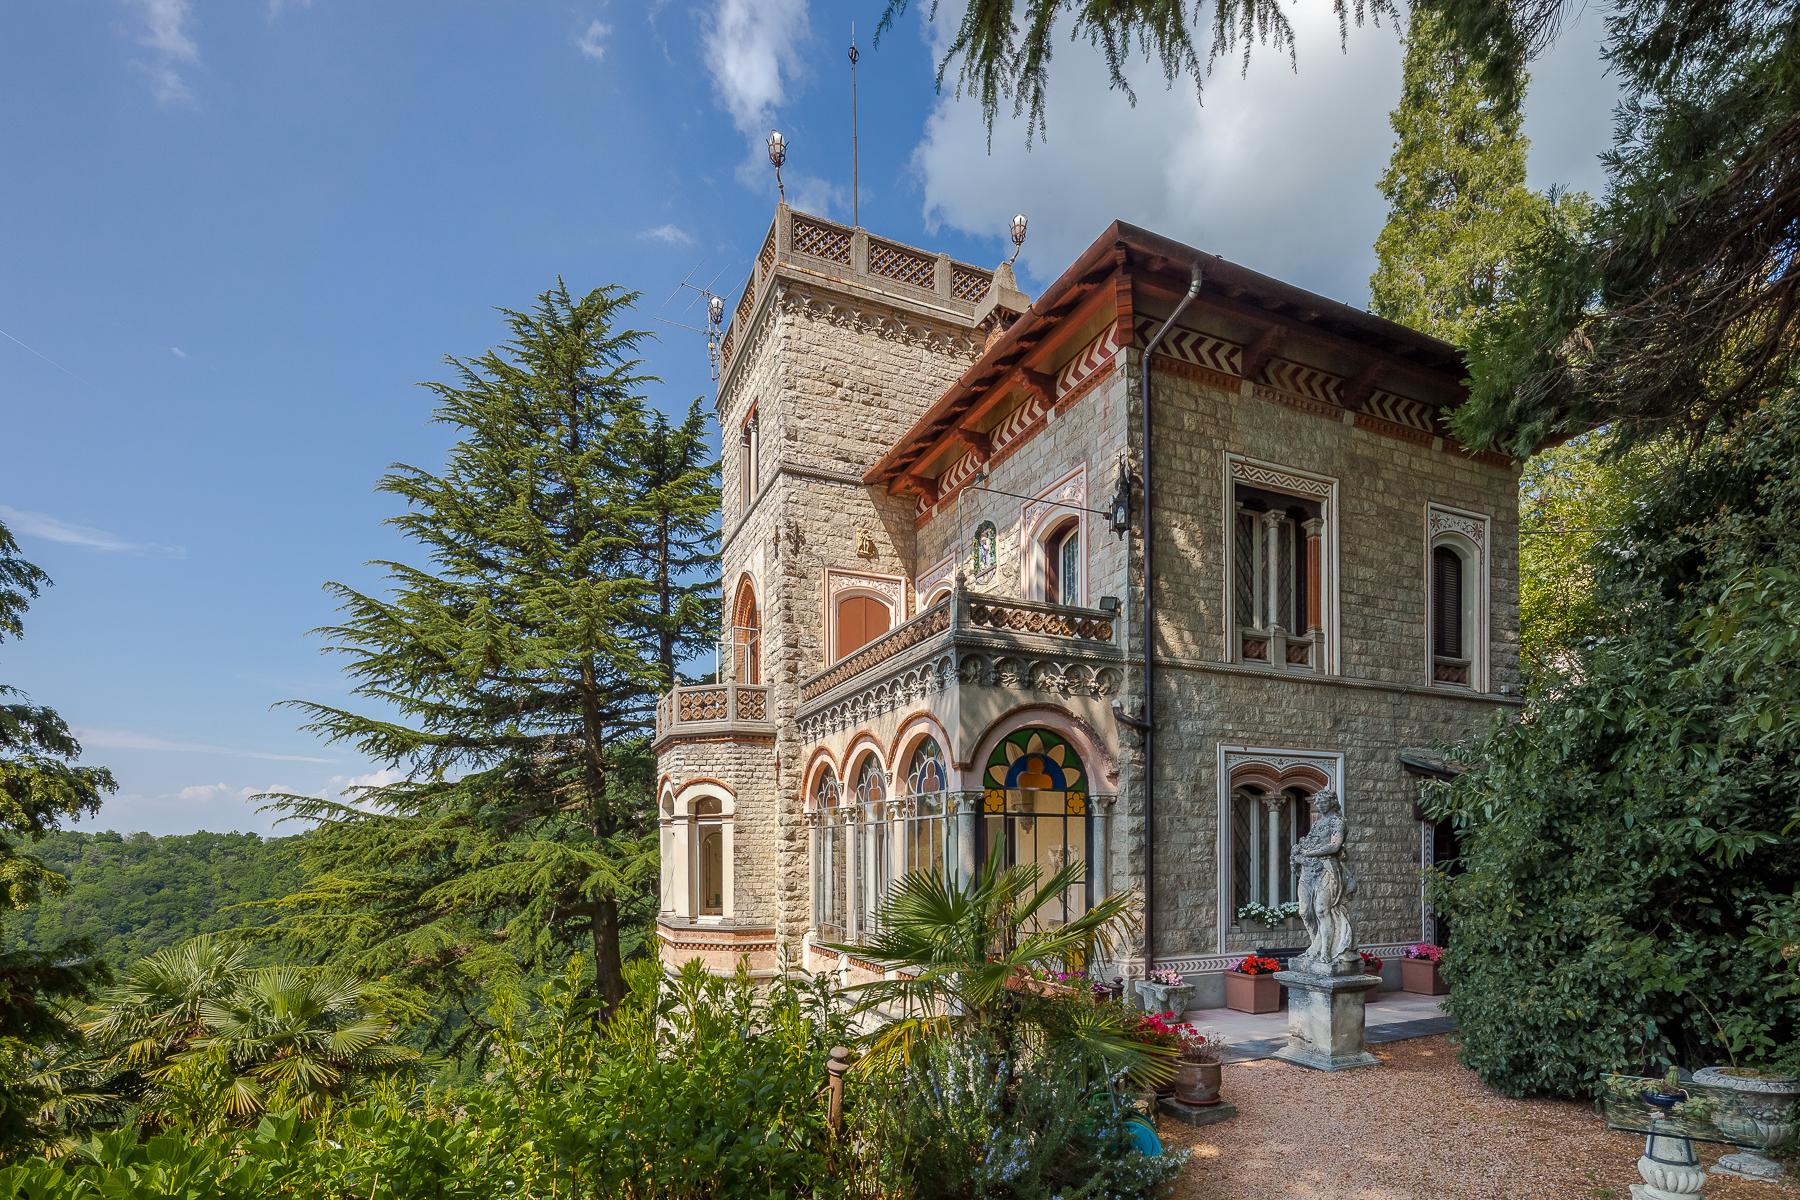 Villa in Vendita a Varese: 5 locali, 375 mq - Foto 4